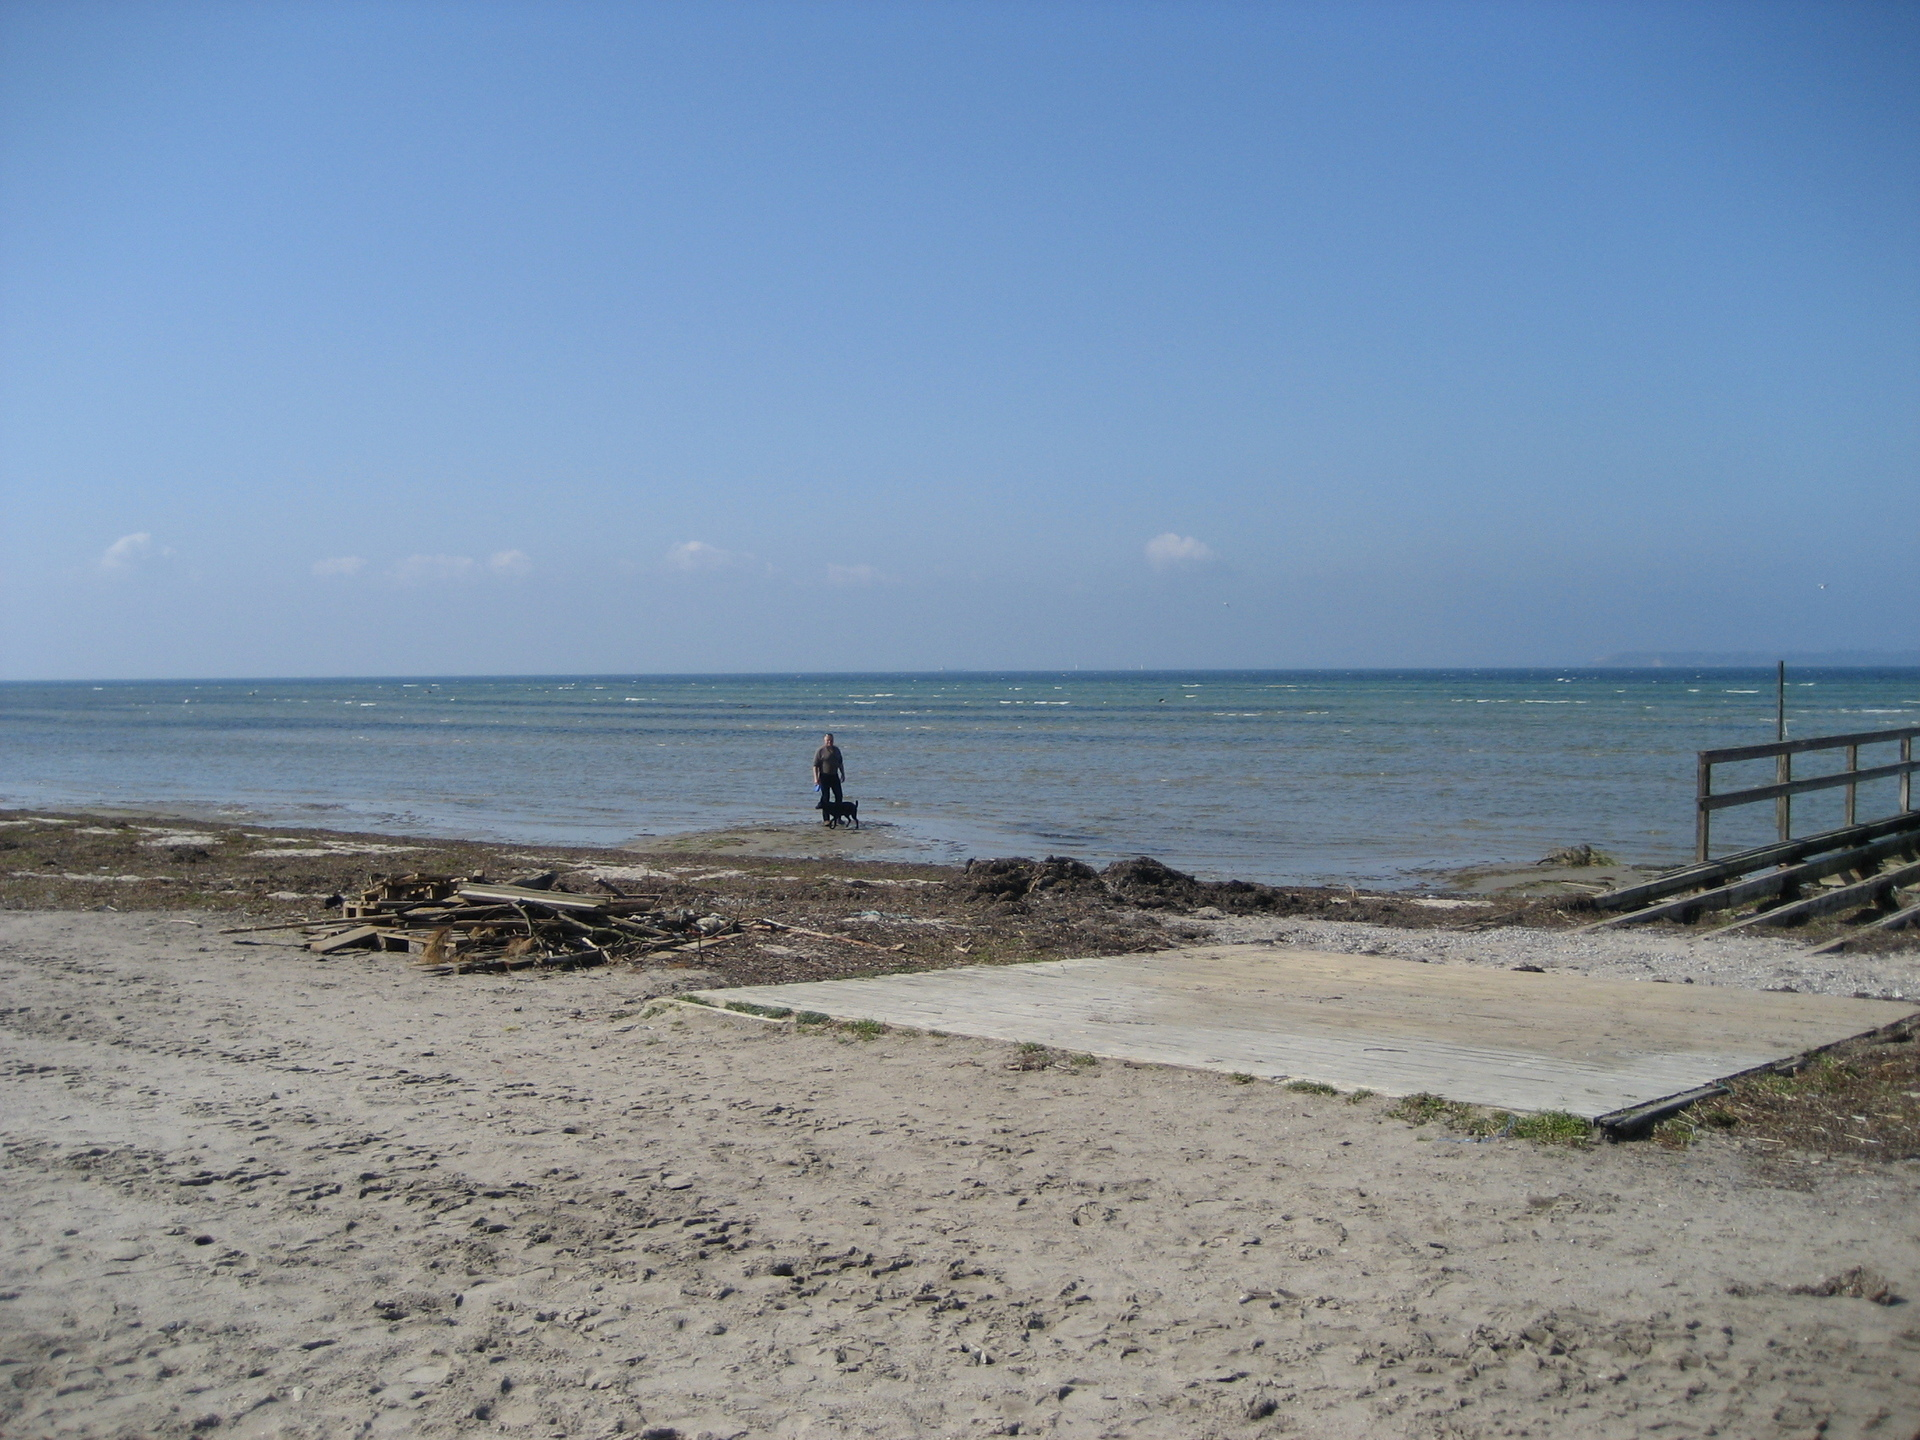 Sweden beaches bdsm picture 95